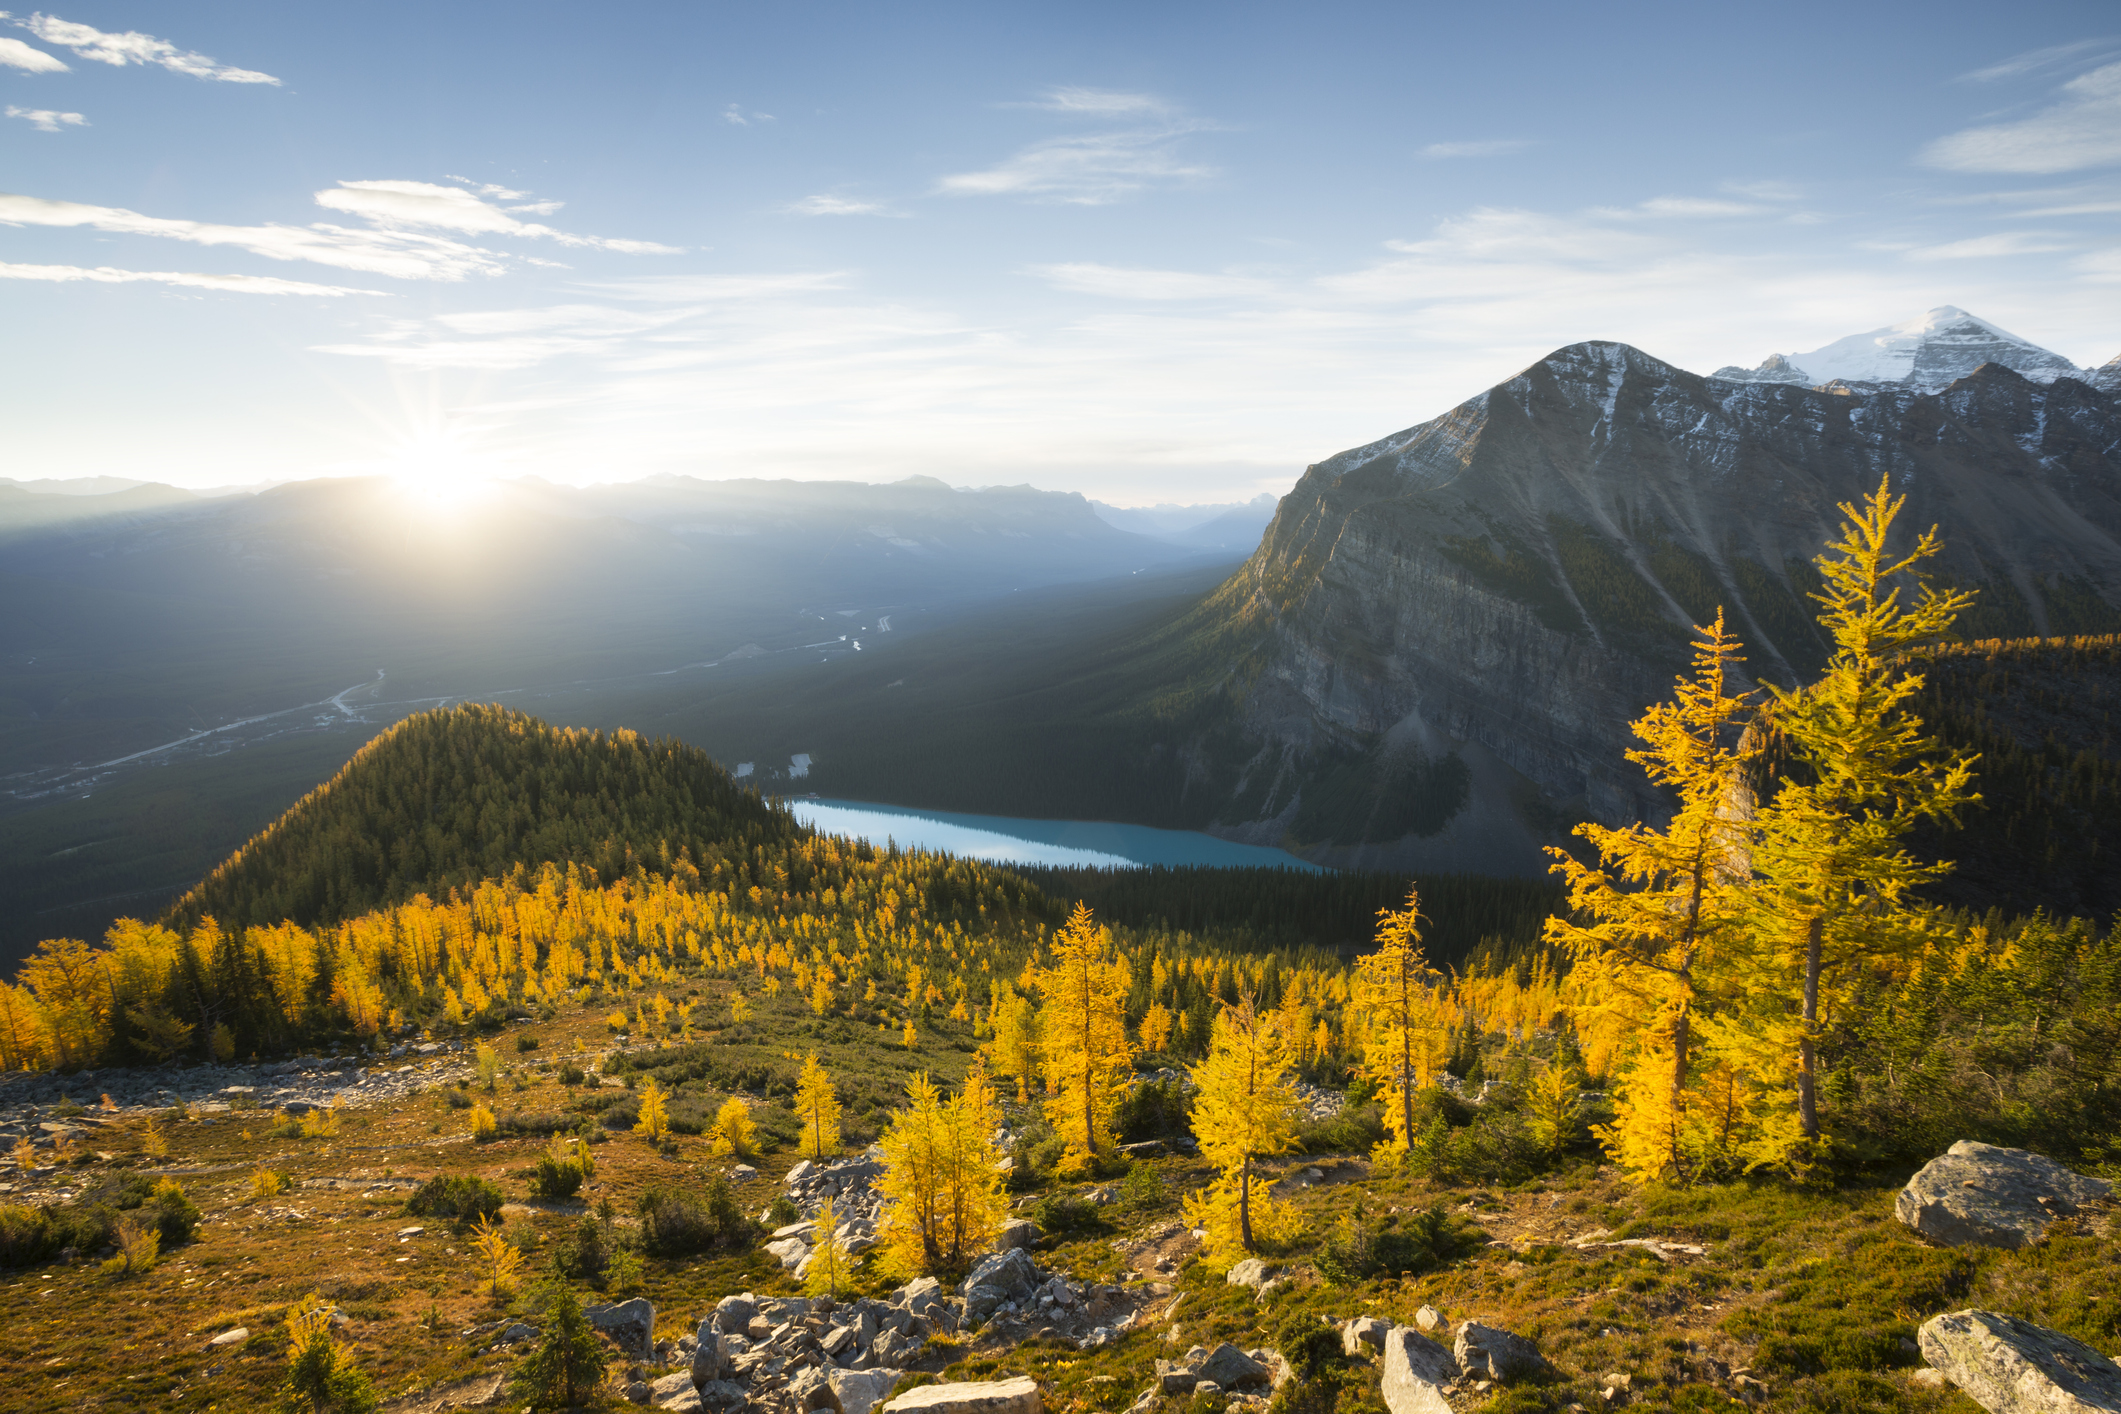 Parque Nacional de Banff, no Canadá. Crédito: